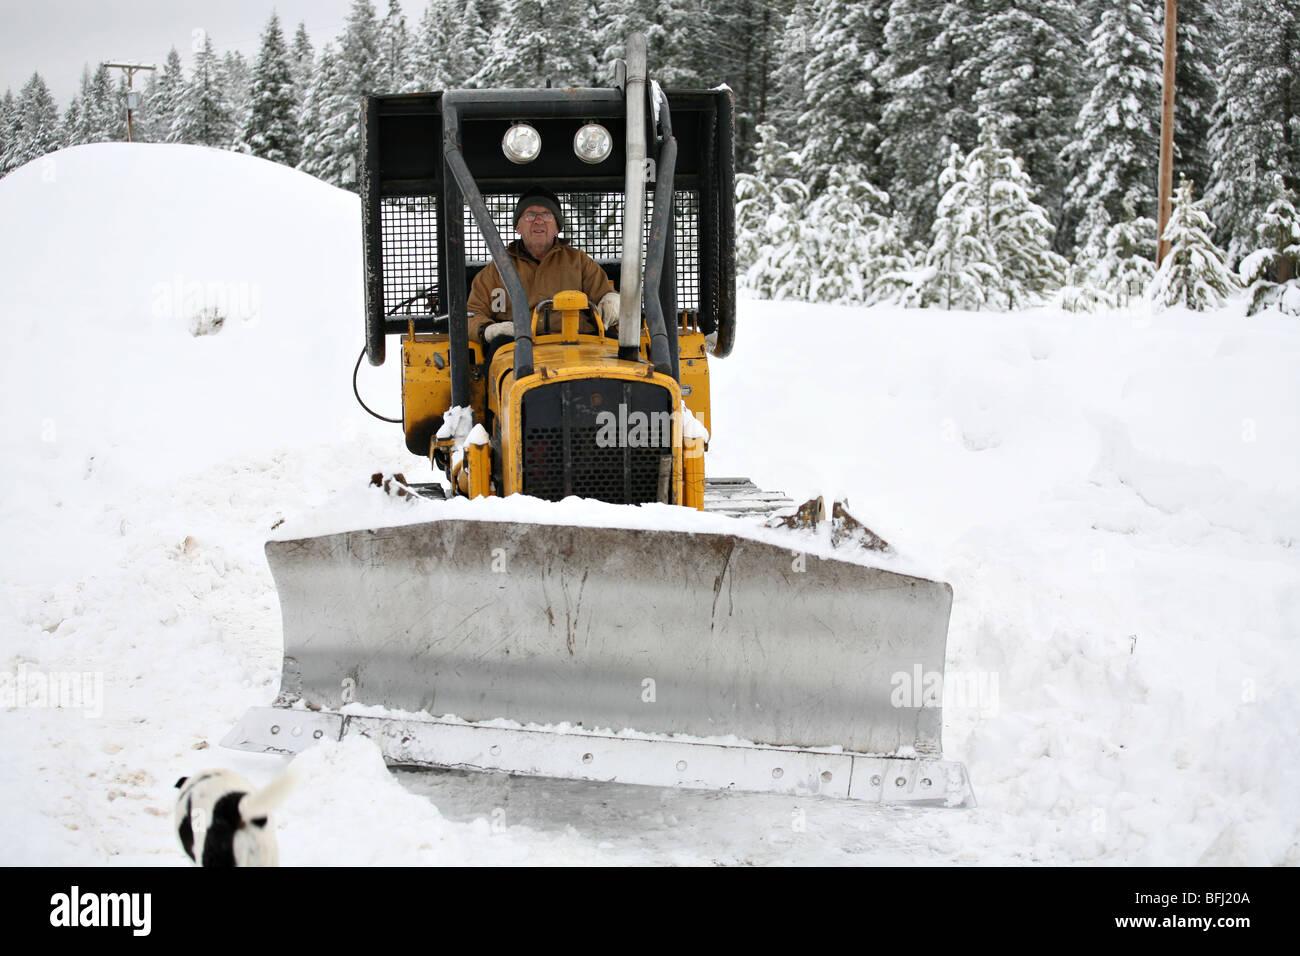 Senior citizen plowing snow in a bulldozer excavator. - Stock Image